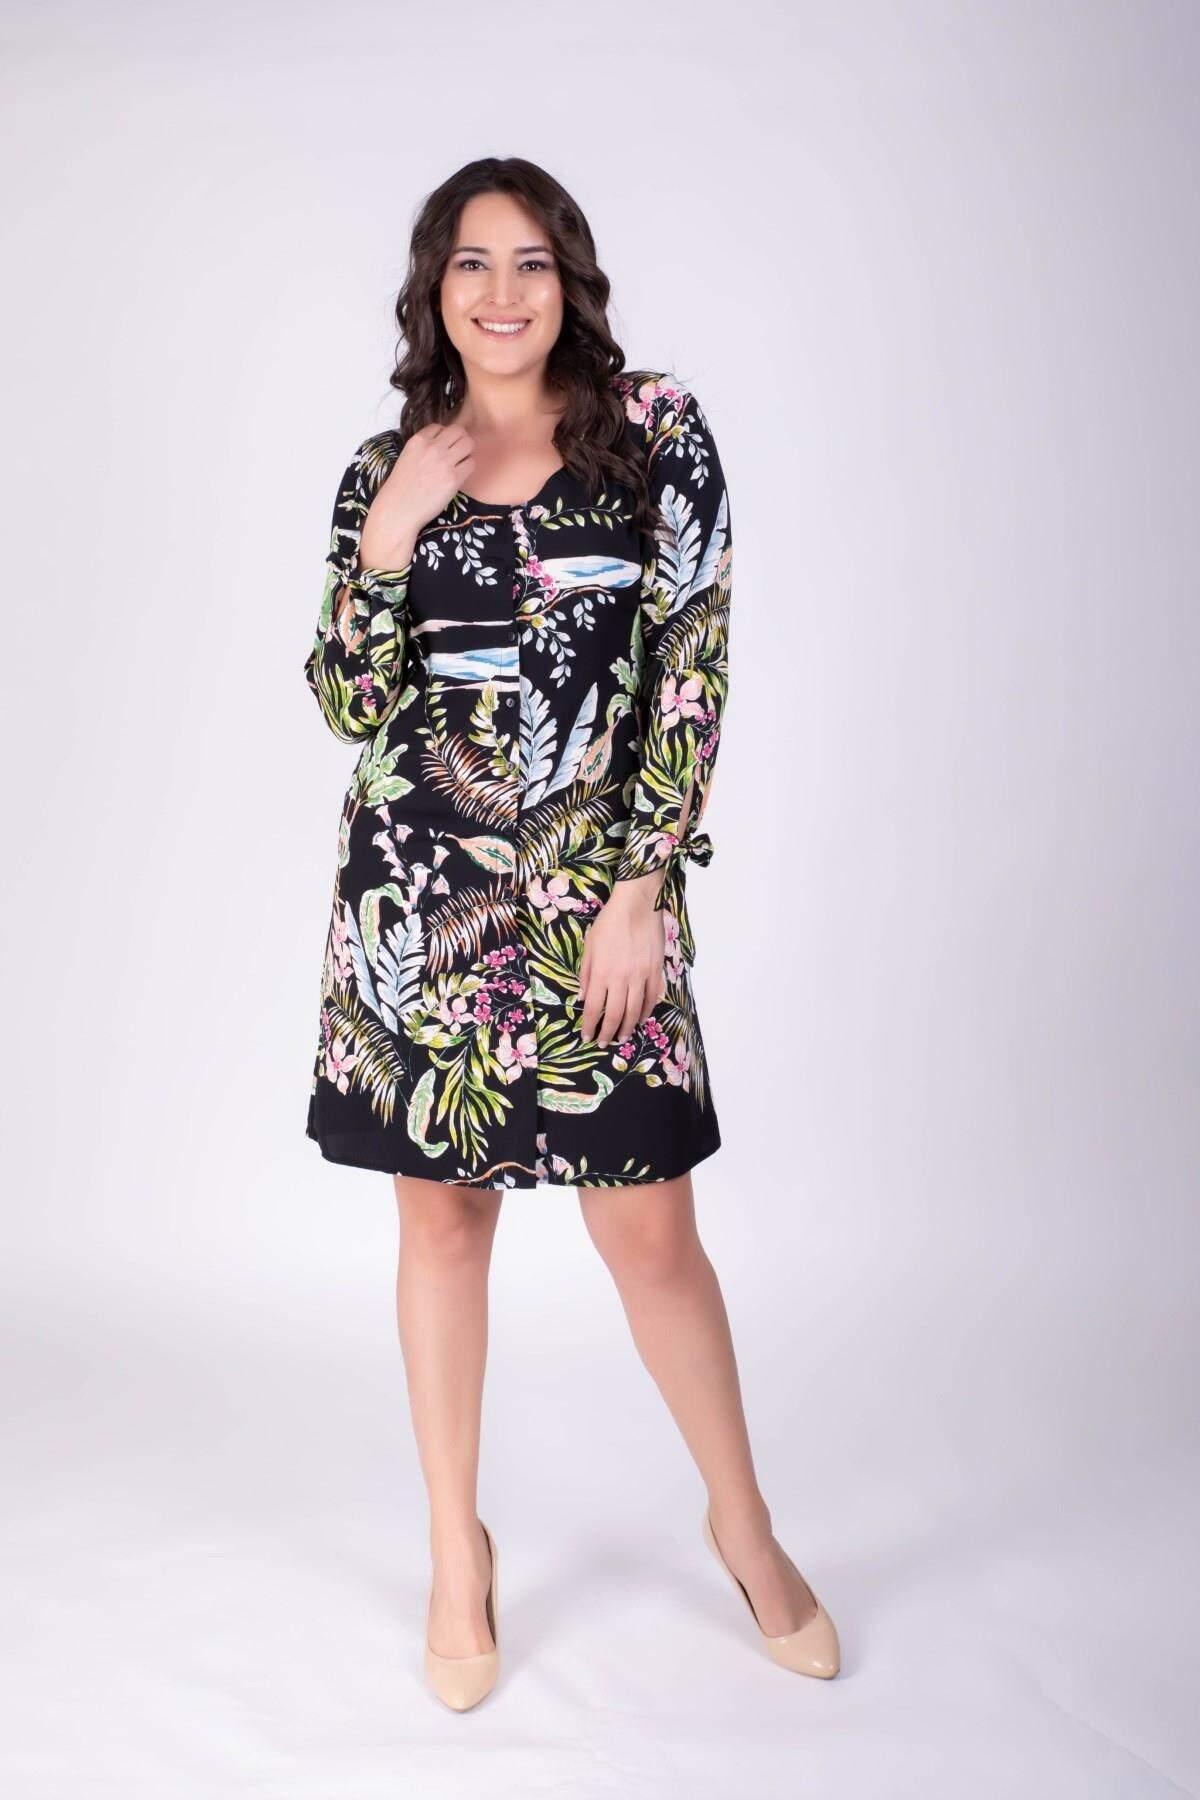 Women's Button Patterned Dress